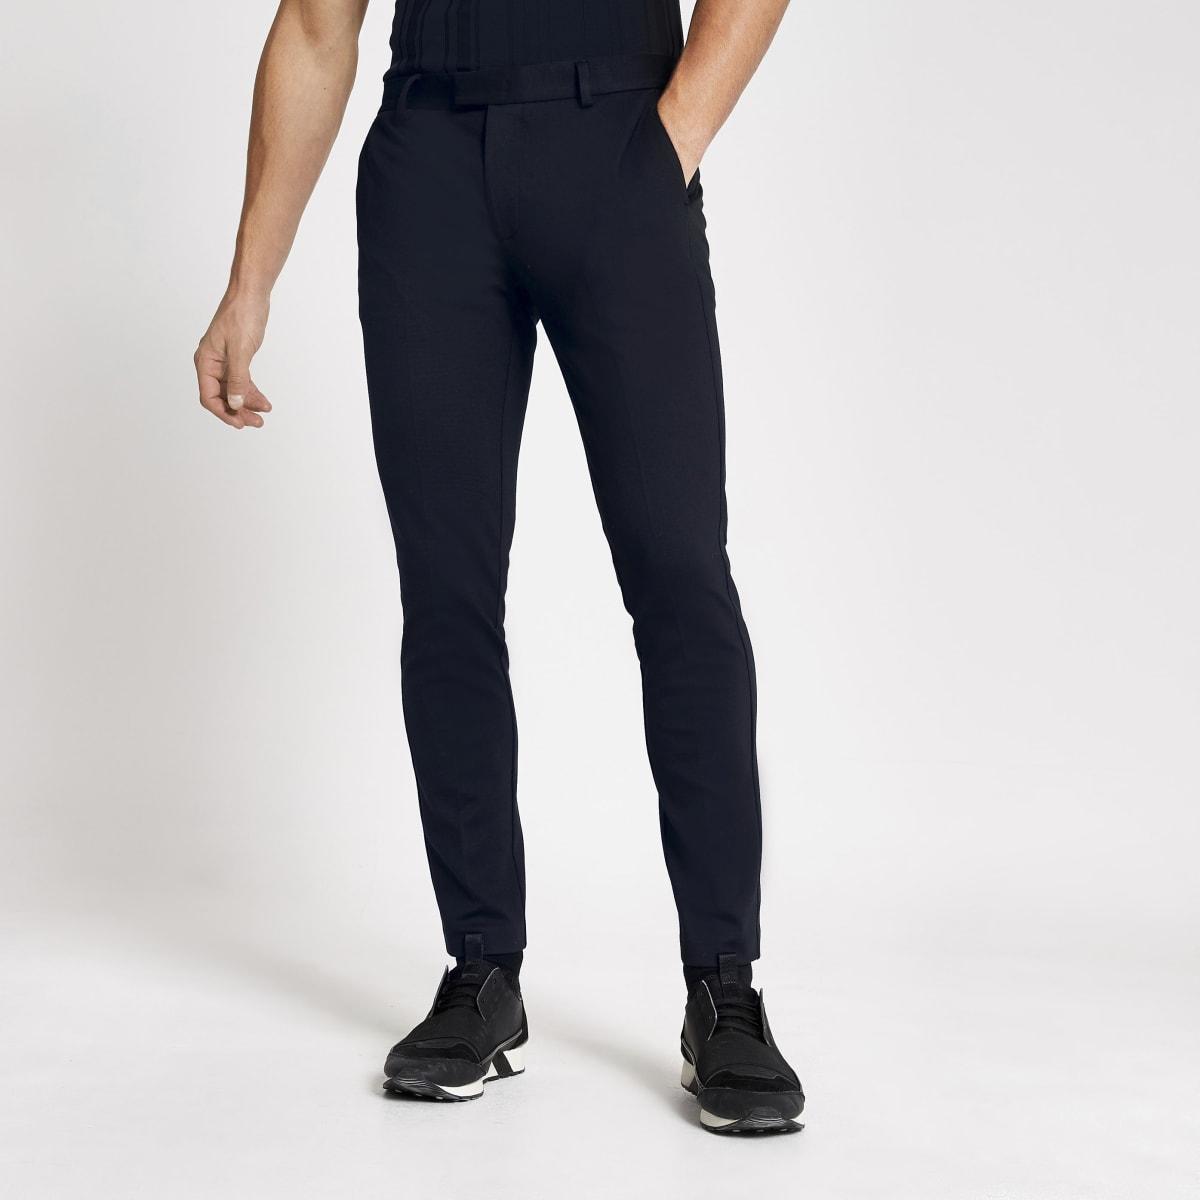 Marineblauwe superskinny-fit pantalon